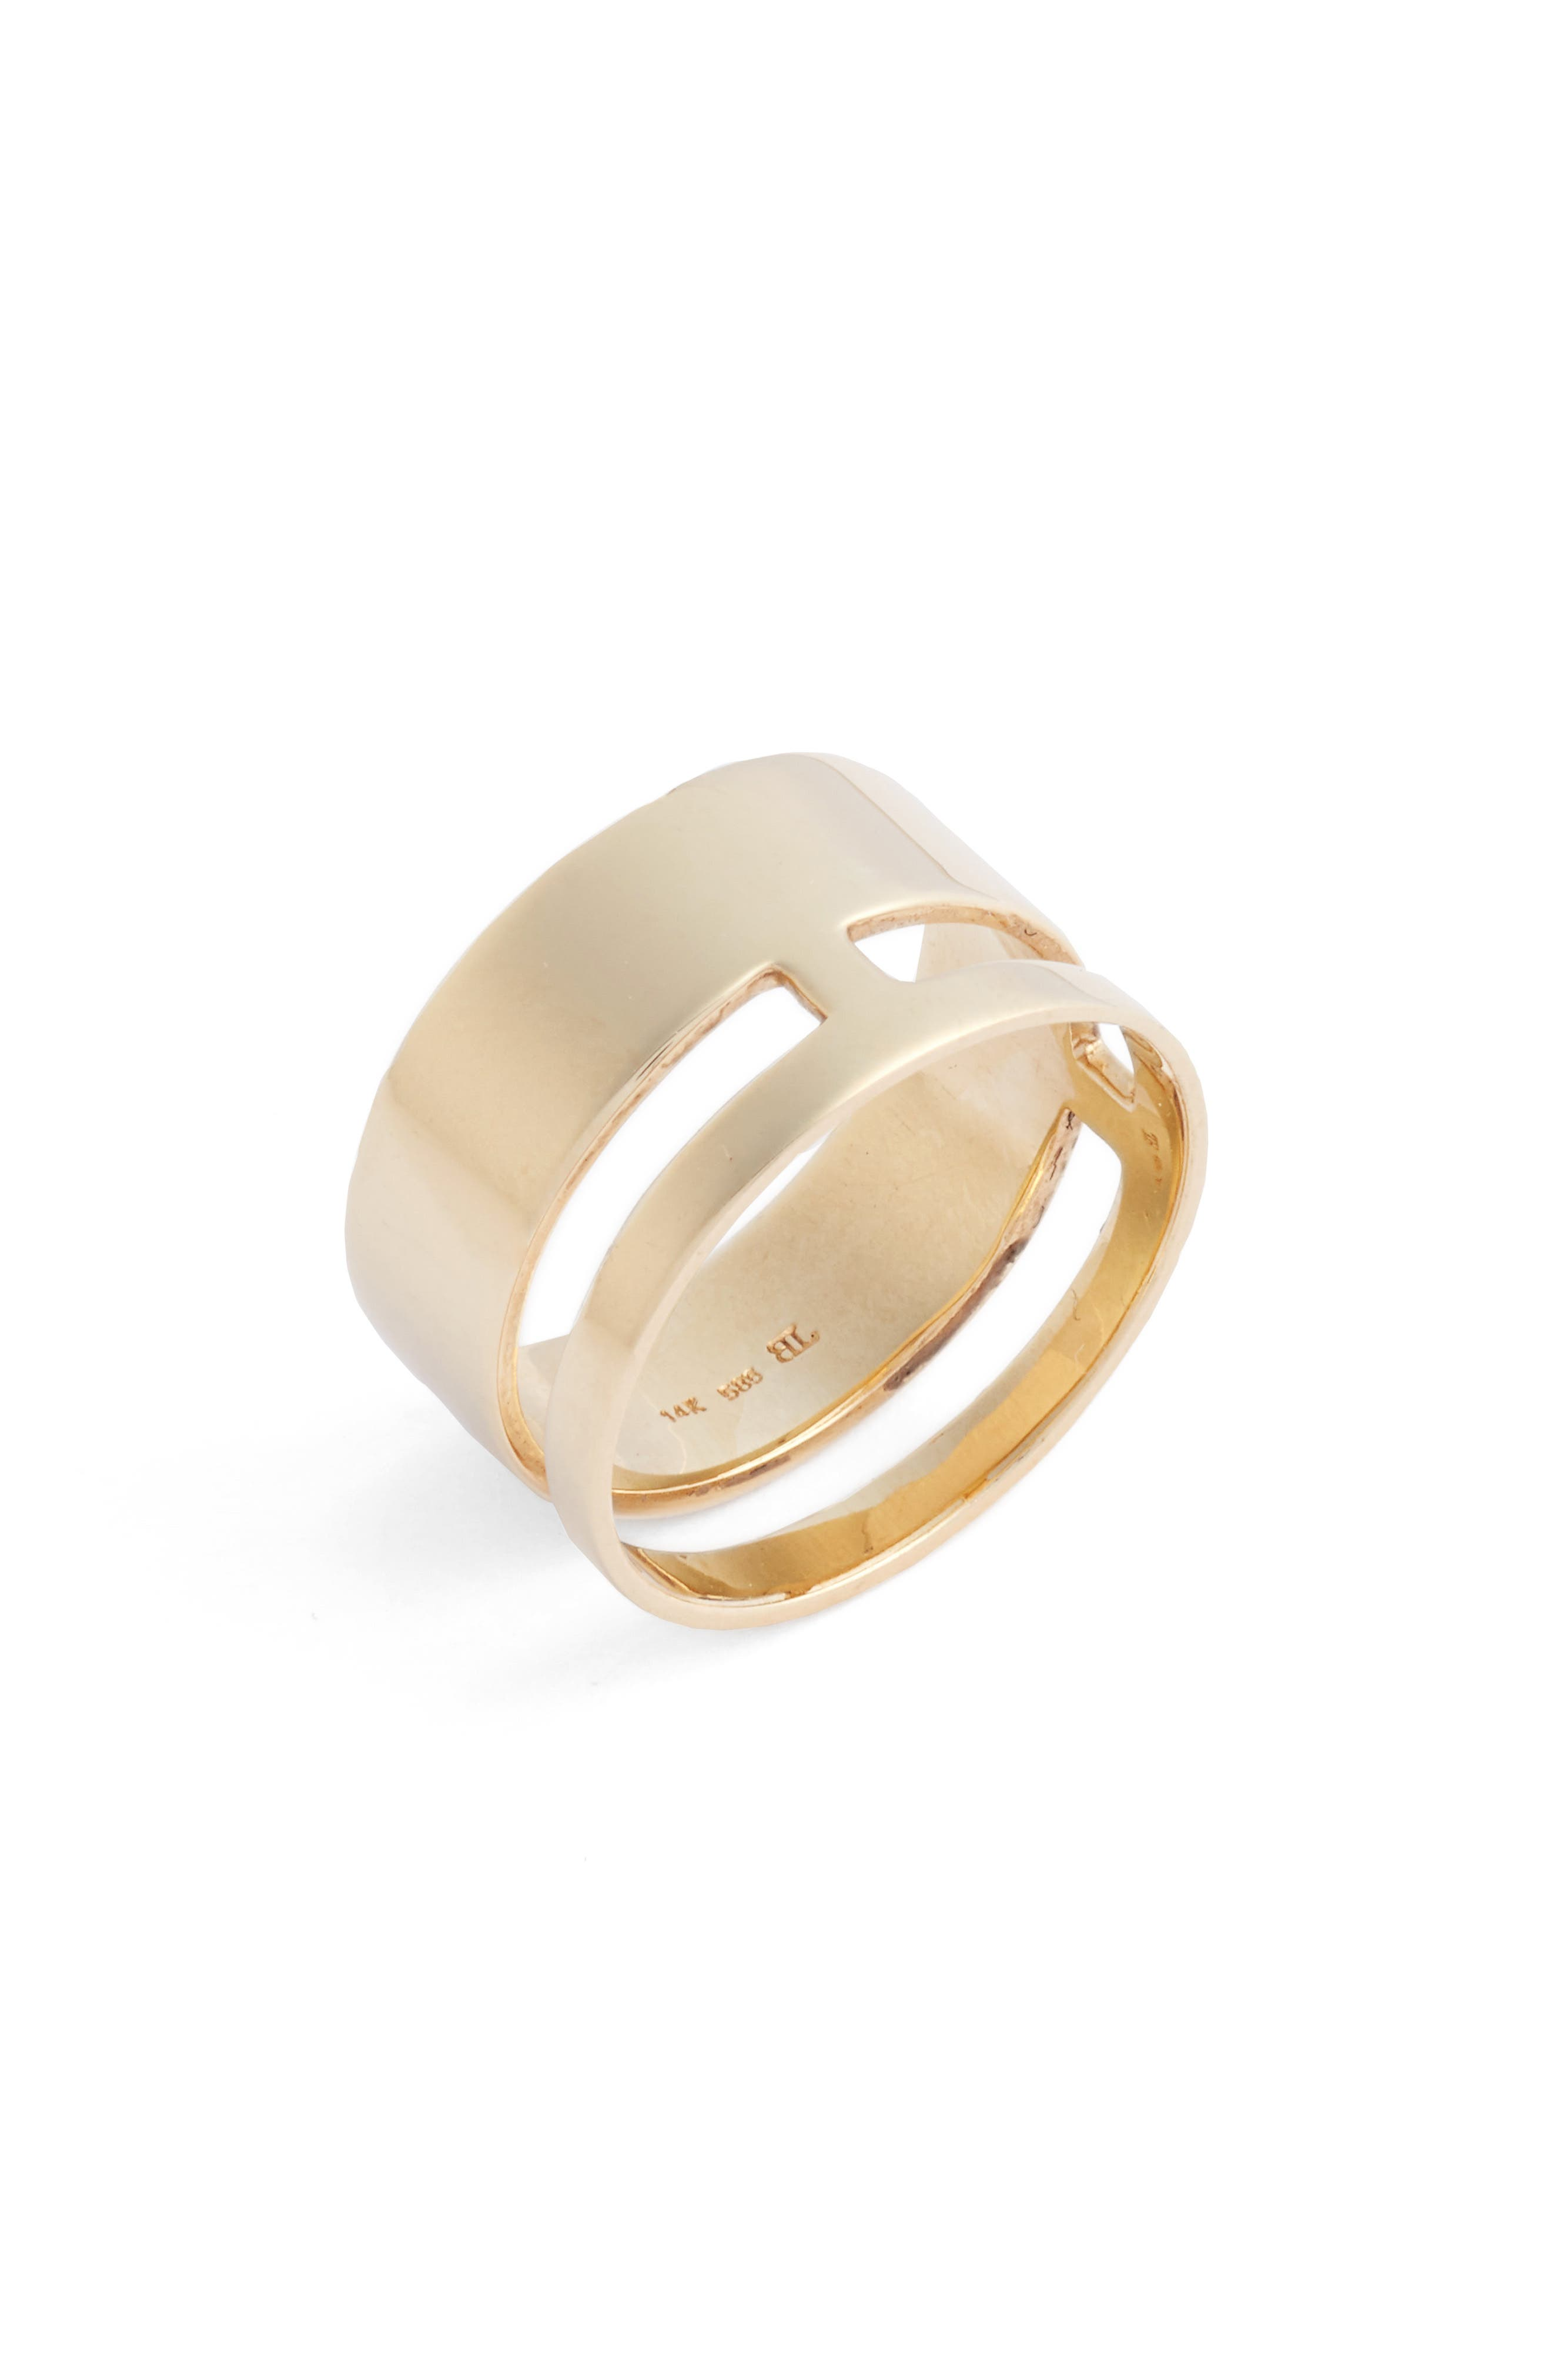 BONY LEVY, Ofira Bold 14K Gold Ring, Main thumbnail 1, color, YELLOW GOLD